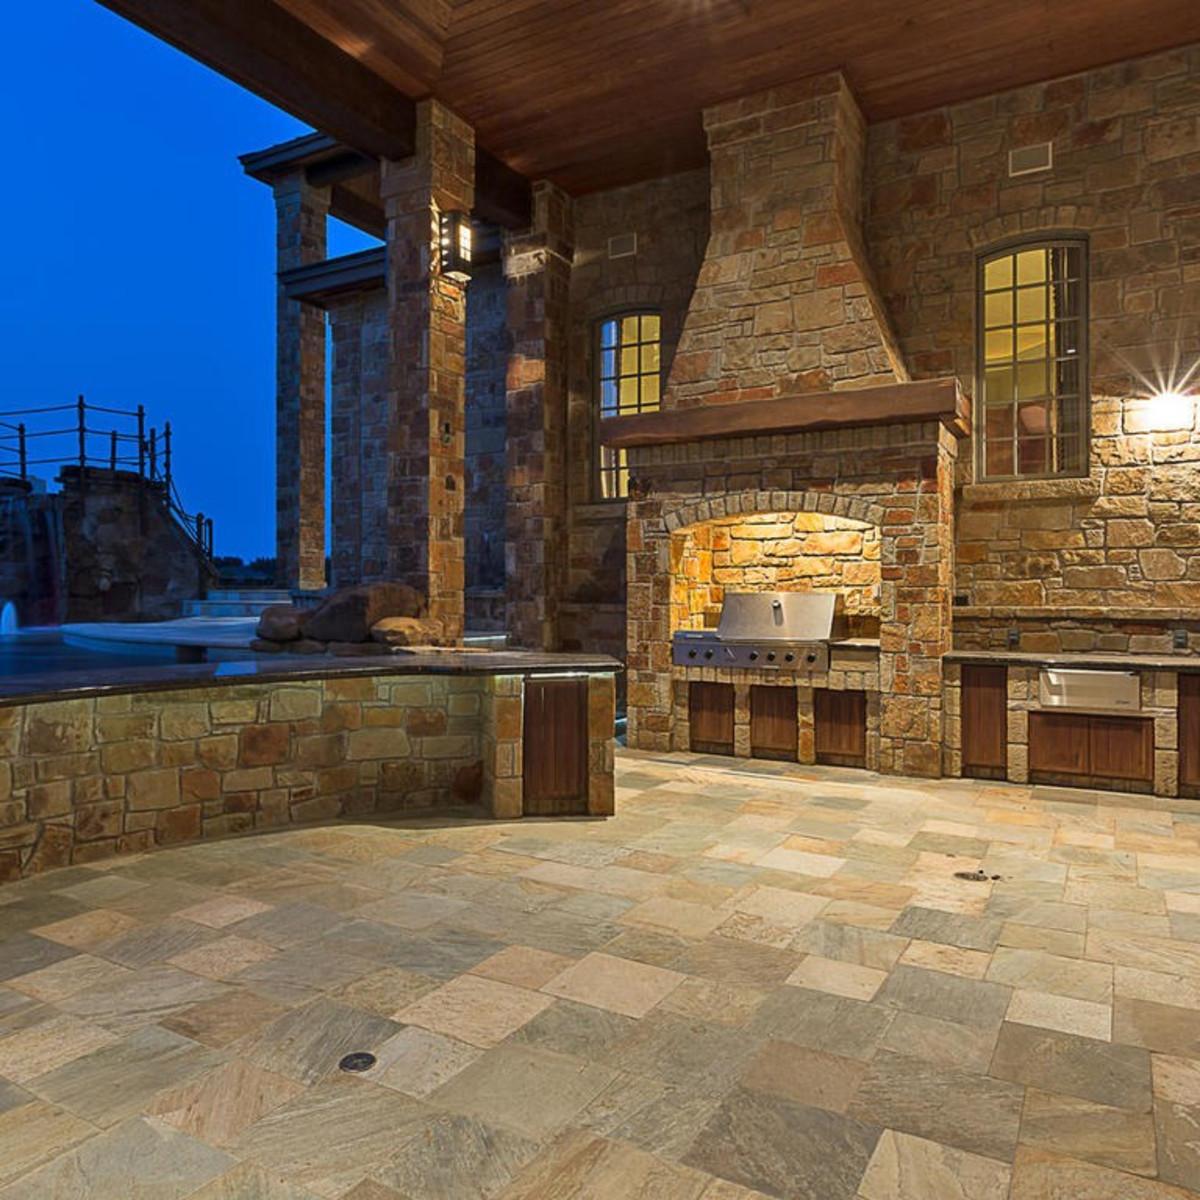 Austin home house 12006 Pleasant Panorama View 78738 Jeff Kent April 2016 outdoor kent